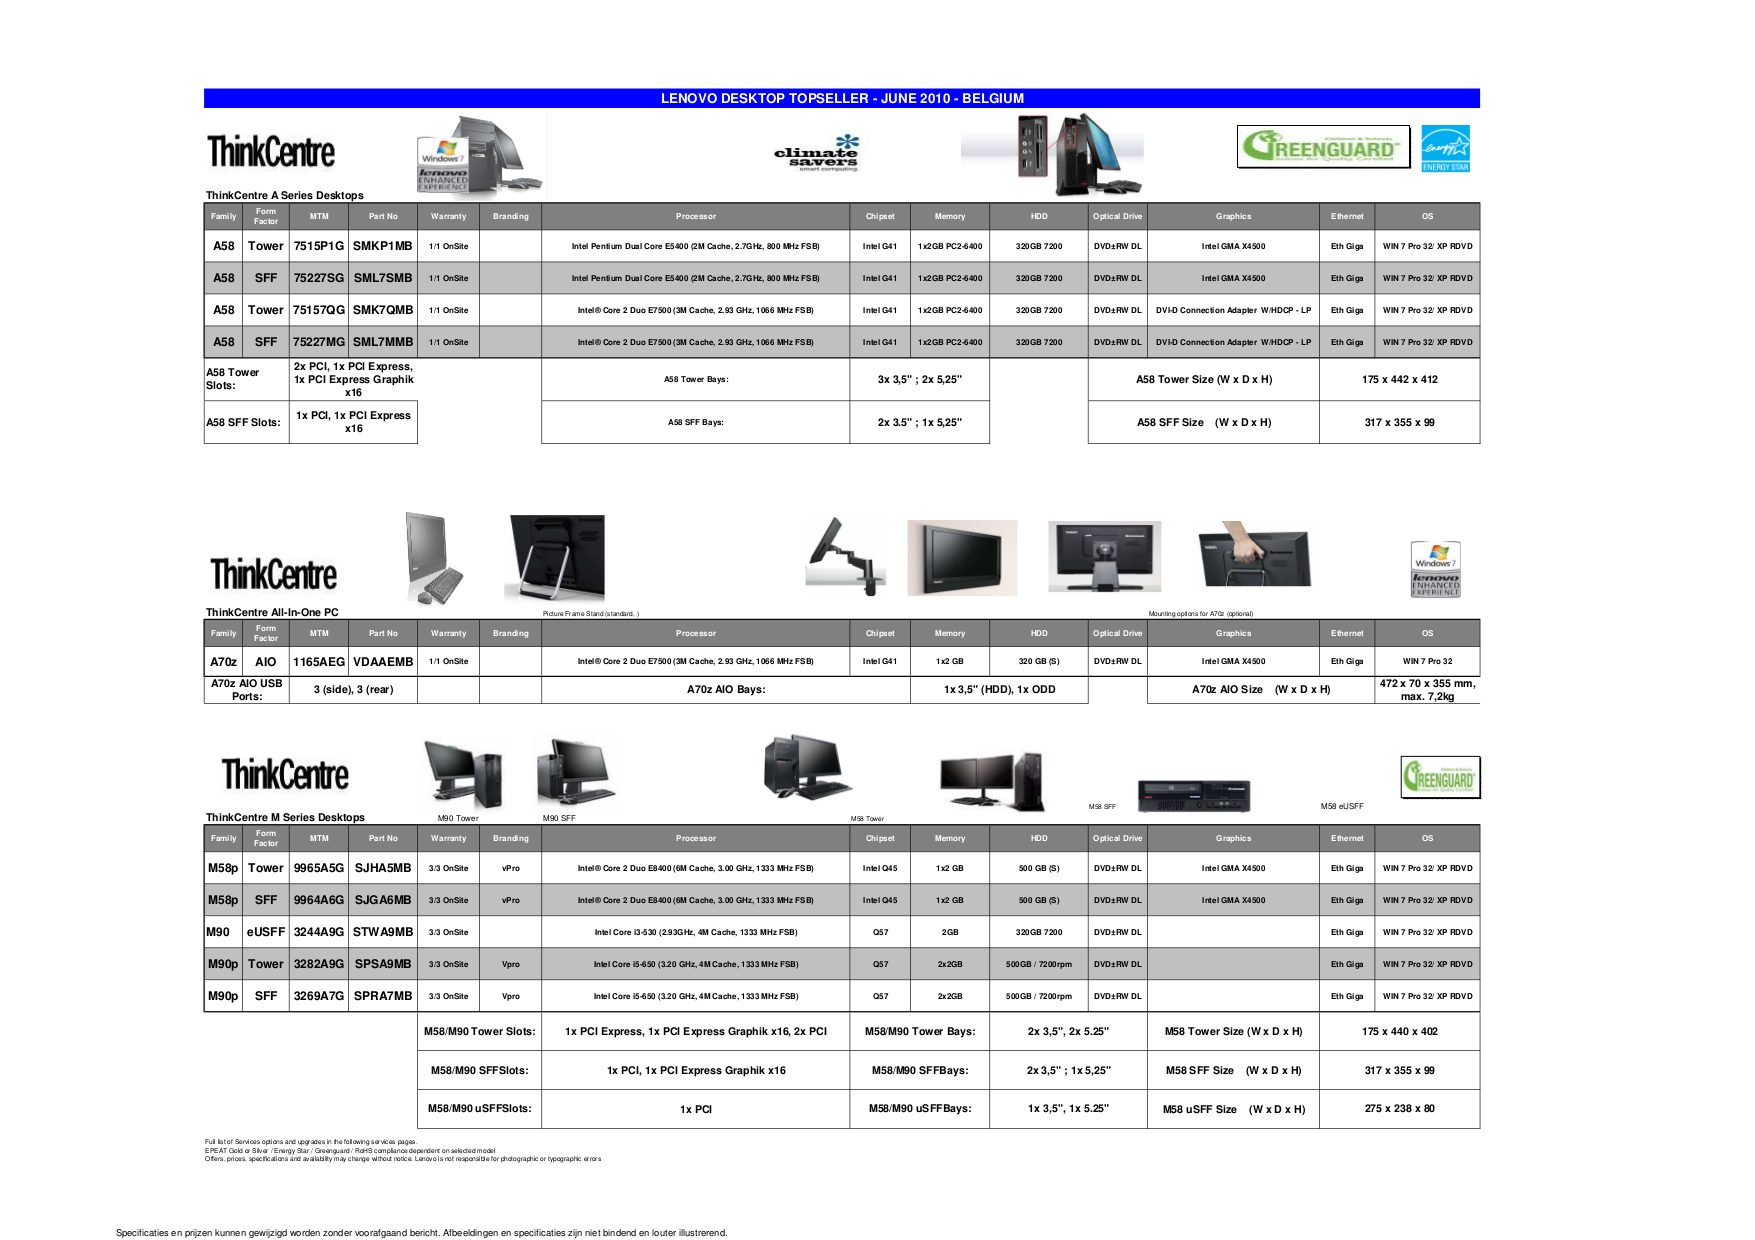 pdf for Lenovo Desktop ThinkCentre M58p 9964 manual